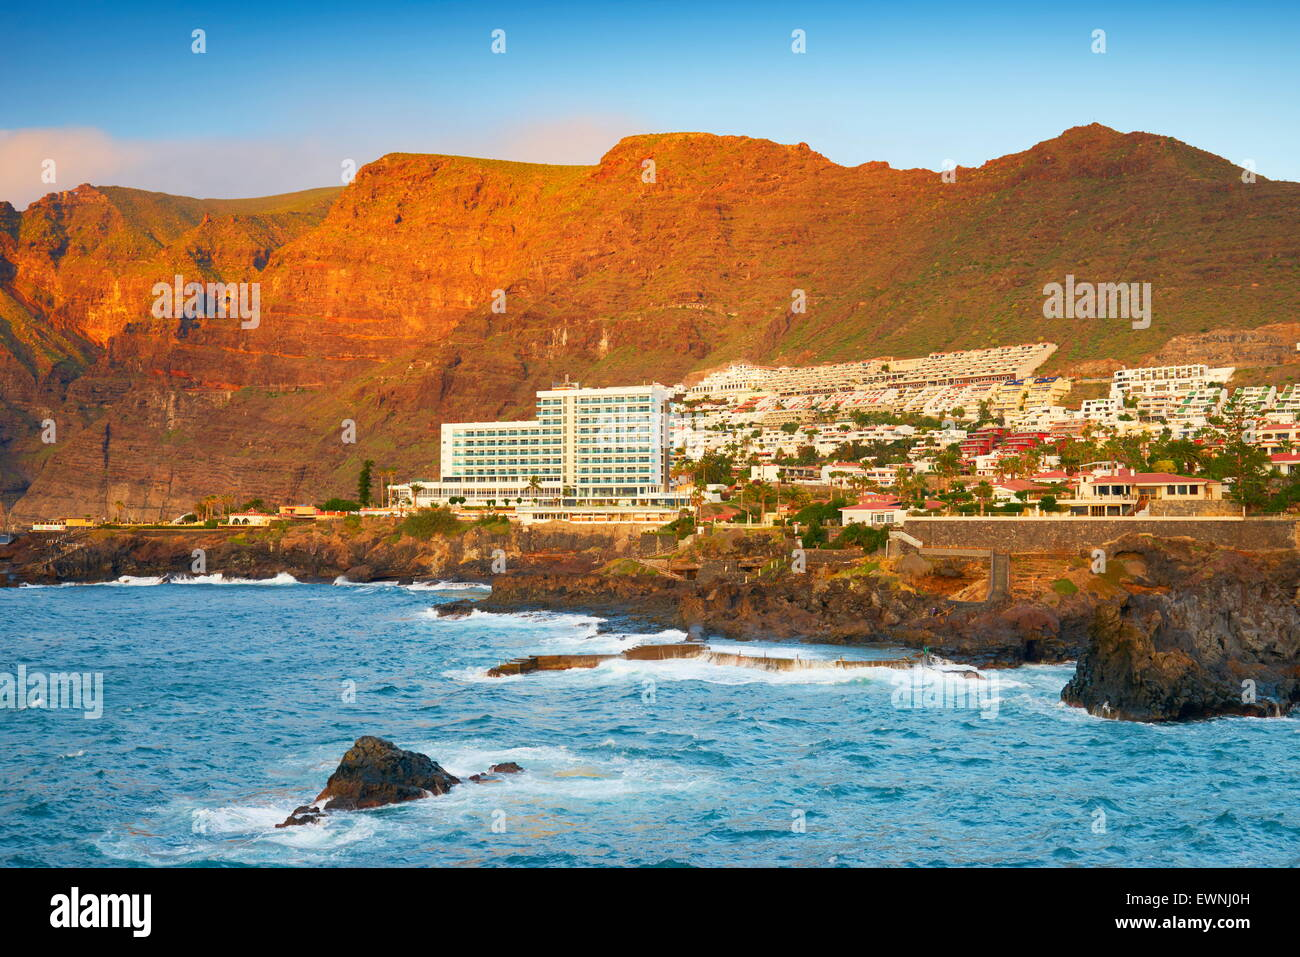 Los Gigantes Klippen, Teneriffa, Kanarische Inseln, Spanien Stockbild